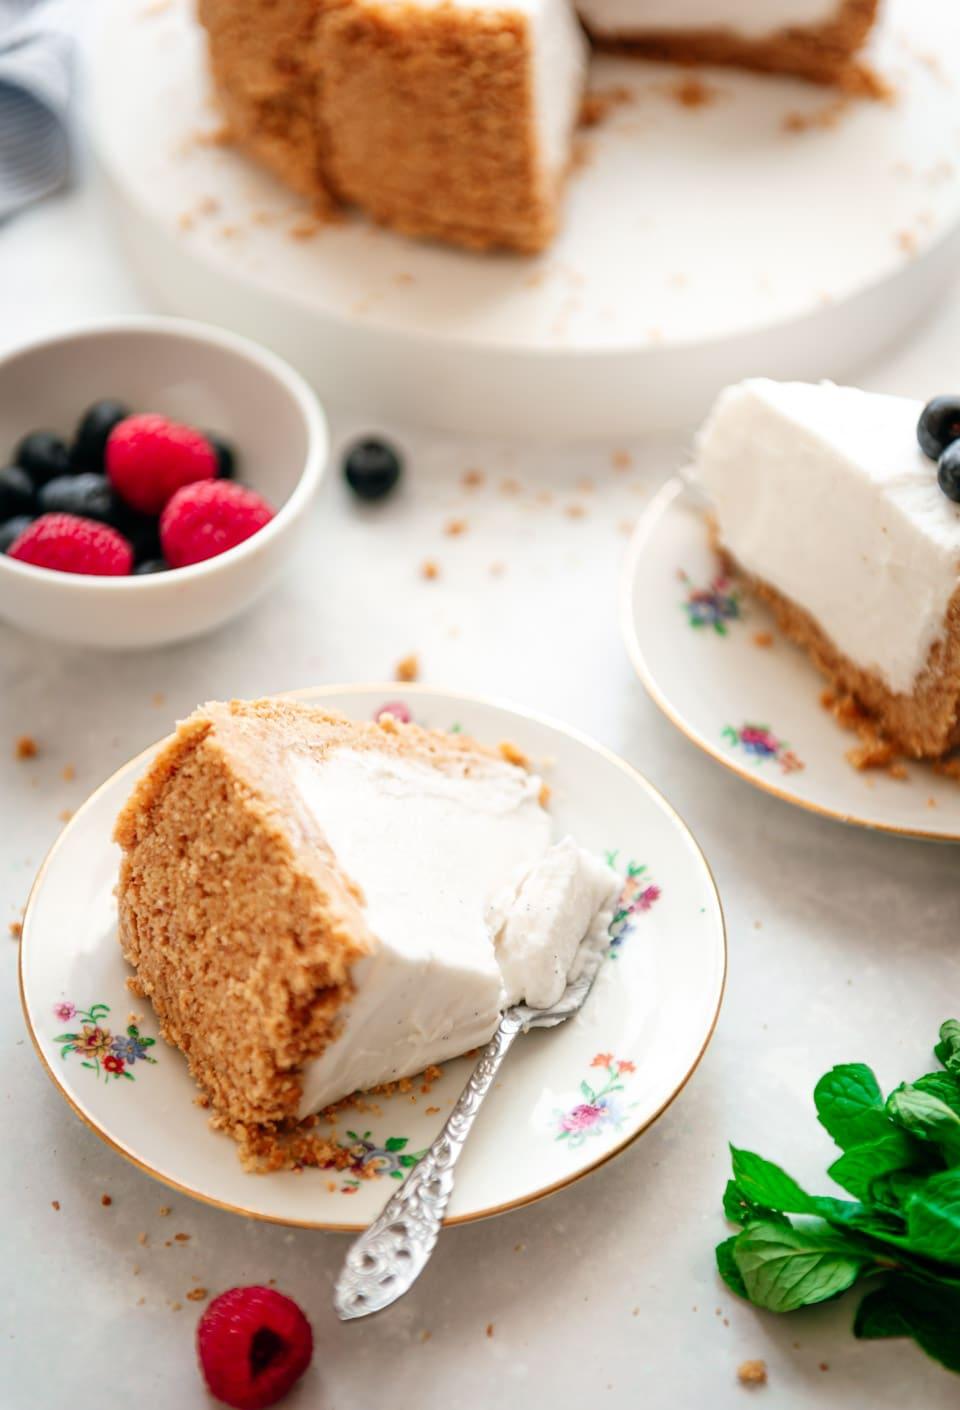 Stukje vegan cheesecake